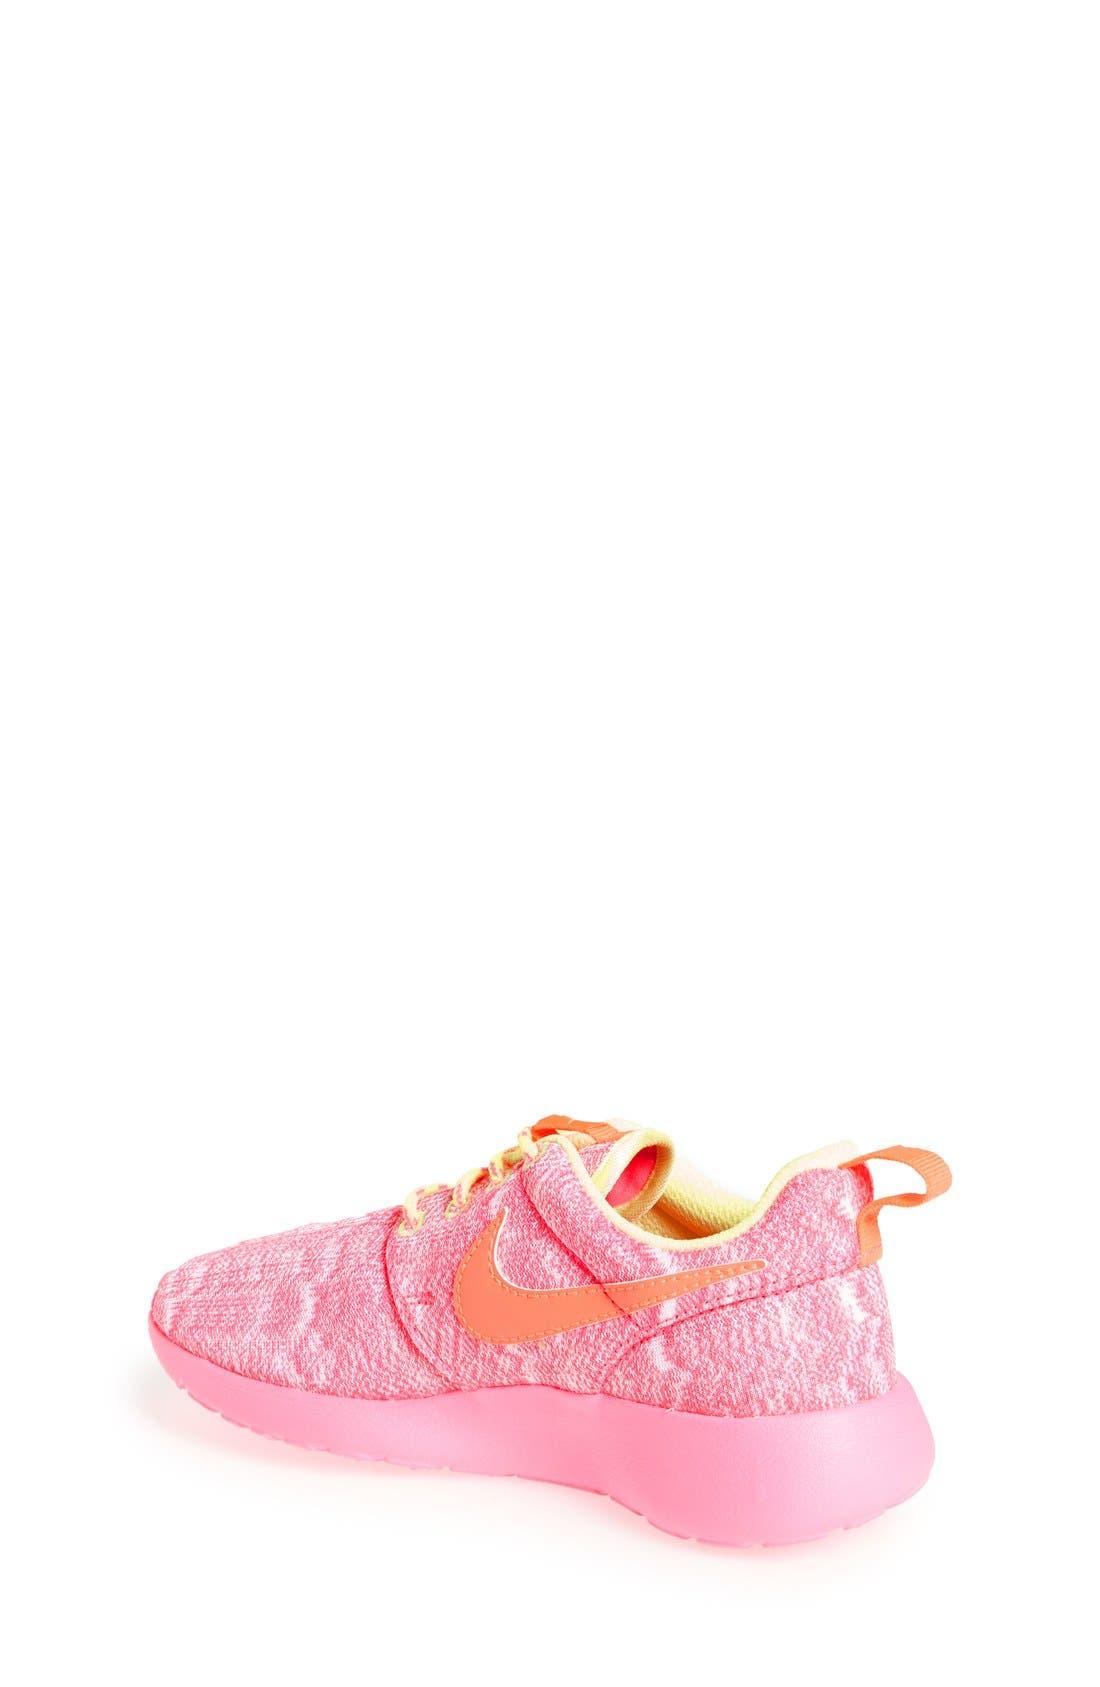 'Roshe Run' Athletic Shoe,                             Alternate thumbnail 142, color,